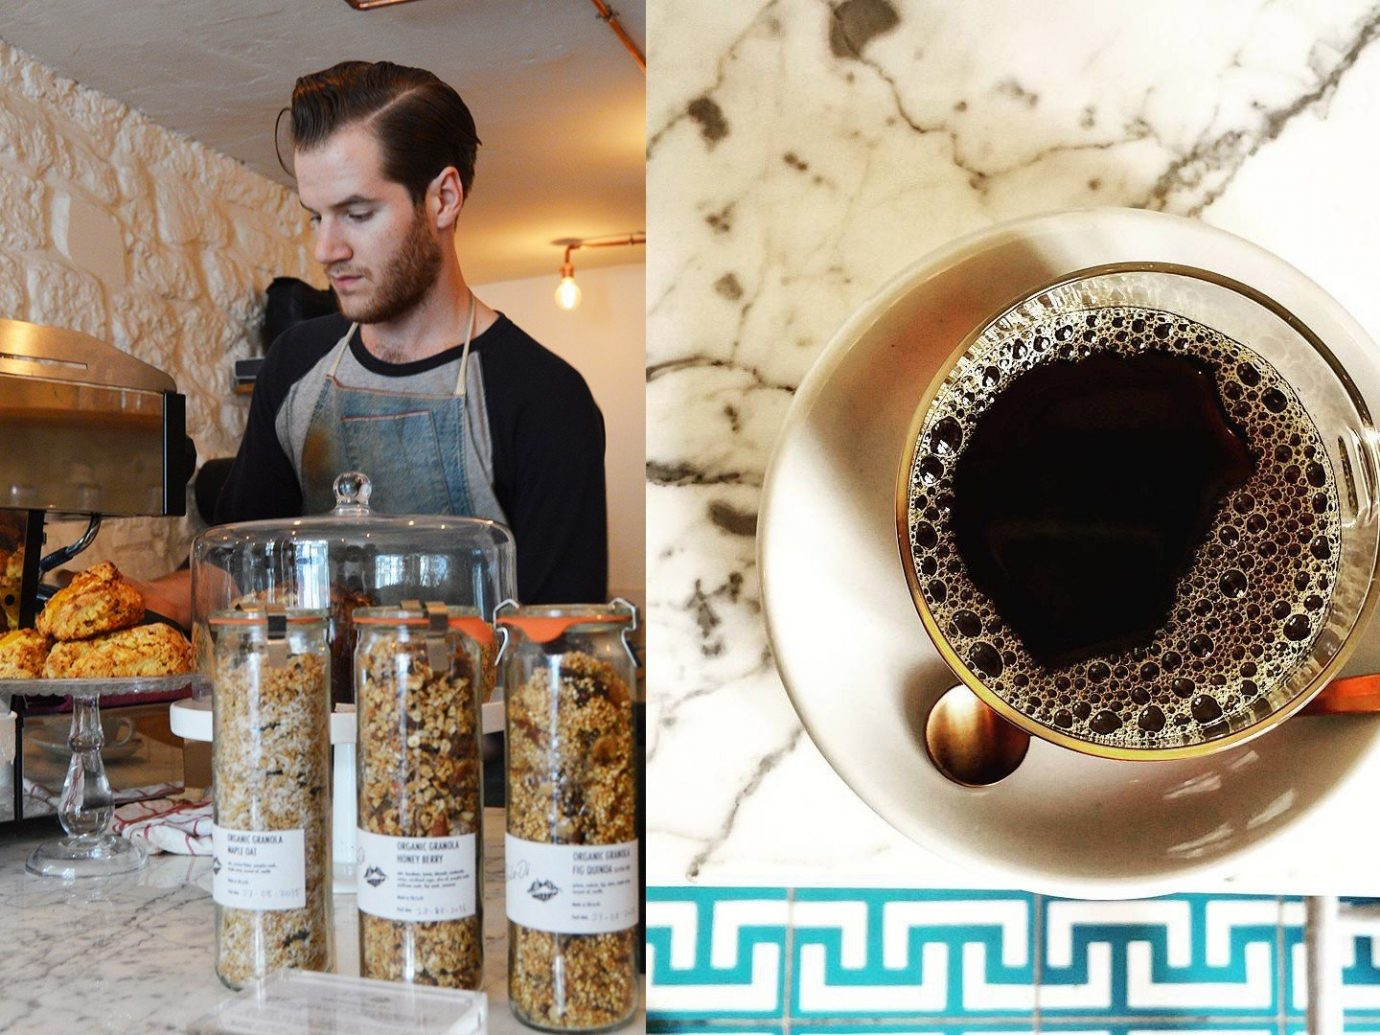 Food + Drink Offbeat Travel Trends Design sense plucked string instruments drum pattern